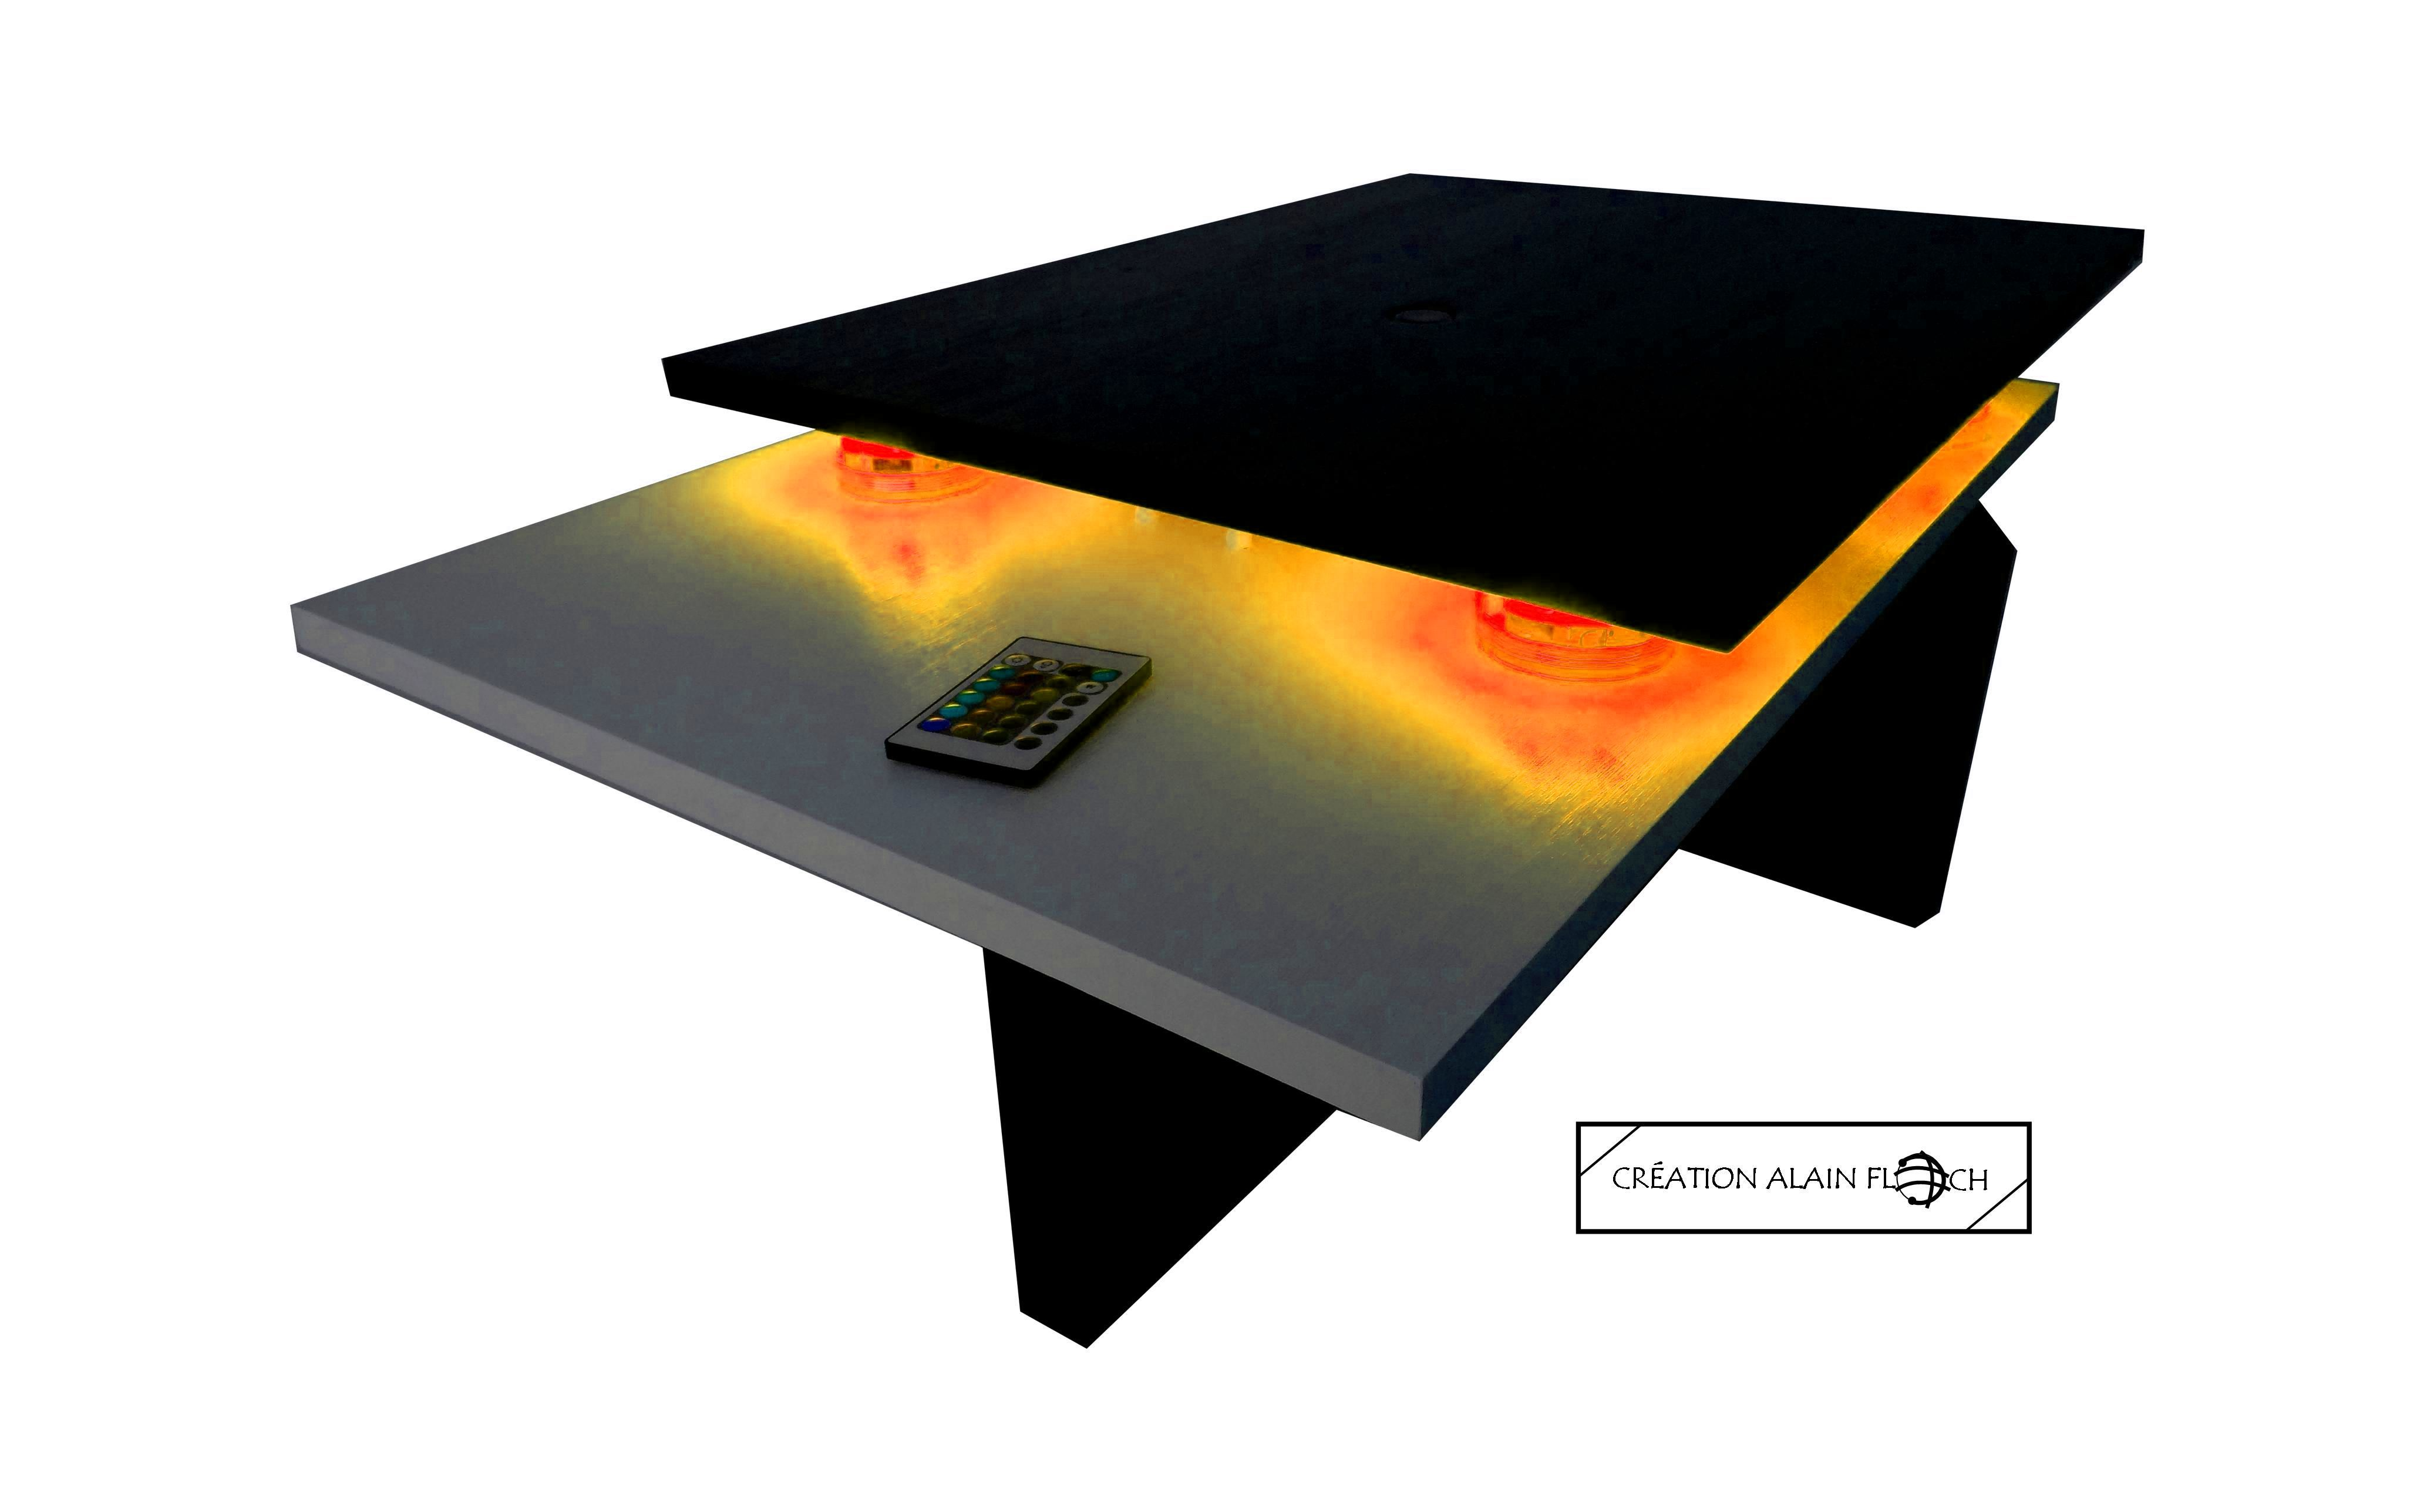 meilleures baskets 6170f b2a18 Table basse design futuriste SPATIALE 40 LED   Table basse ...